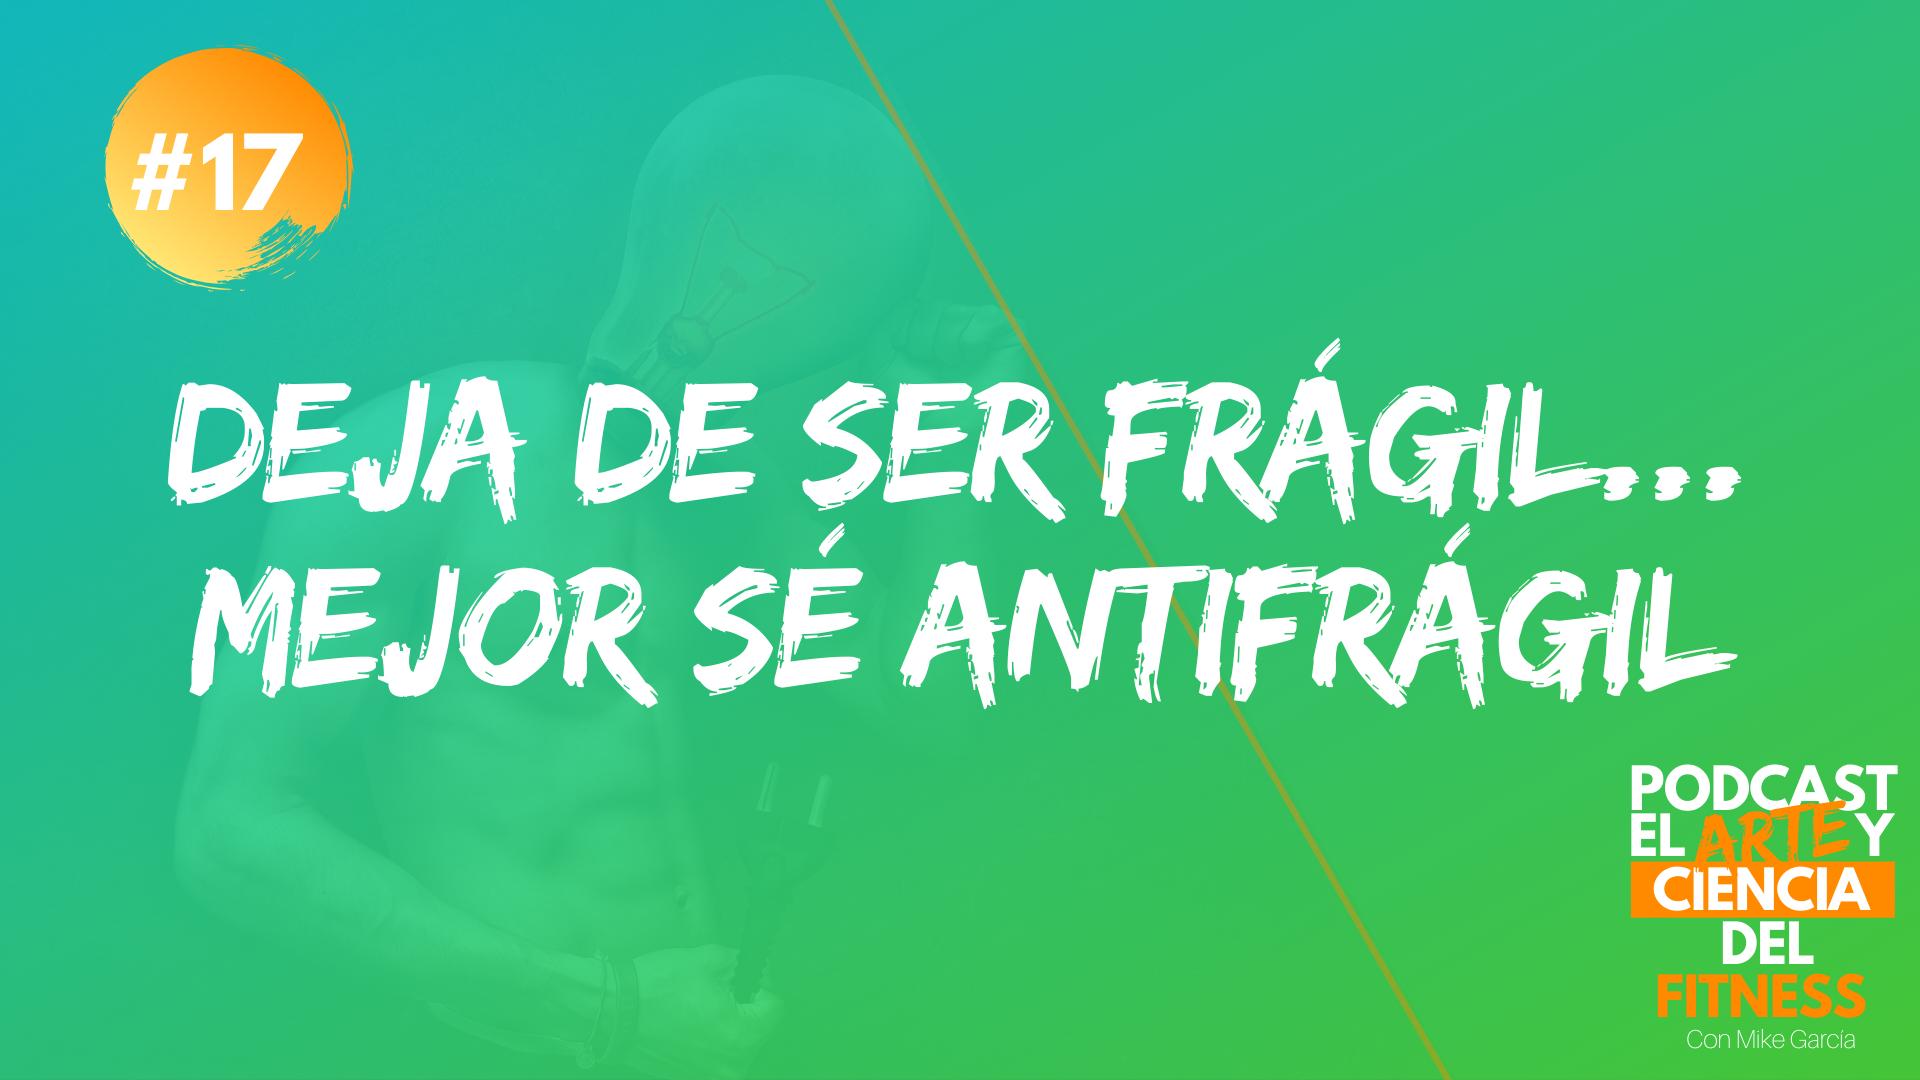 Podcast #17: Deja De Ser Frágil… Mejor Sé Antifrágil